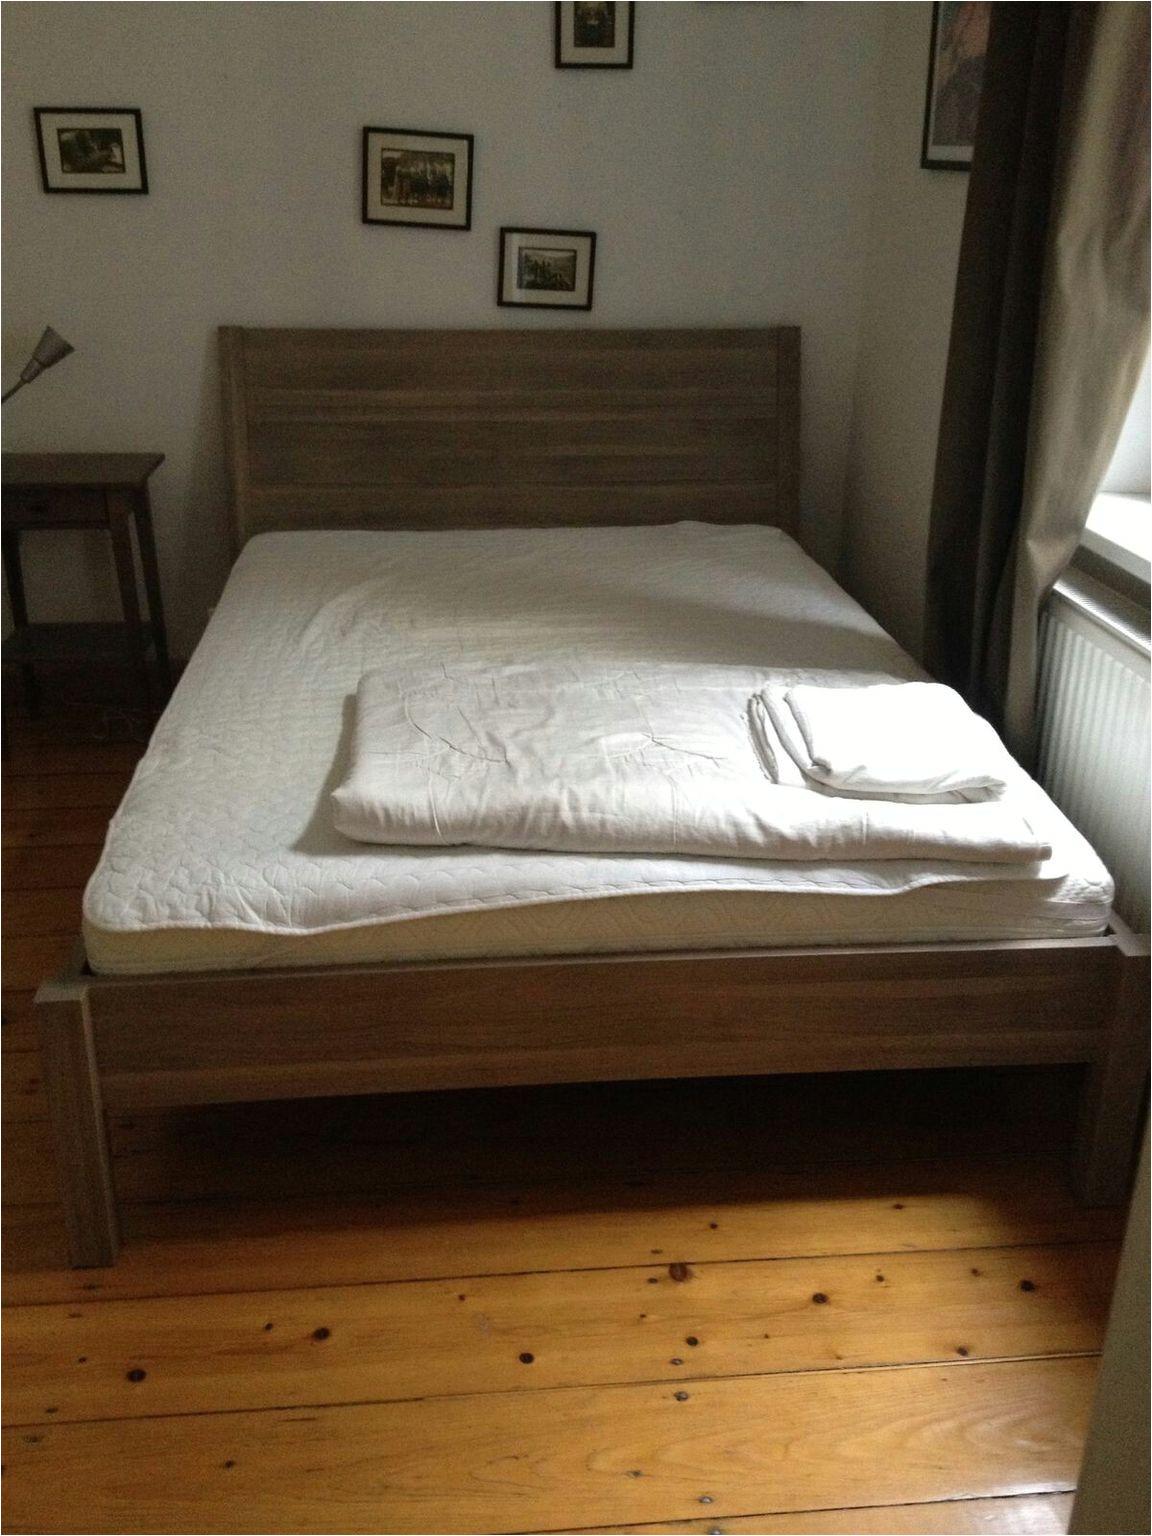 bedframe 140x200 cheap ikea fjellse x bed frame no slats includes